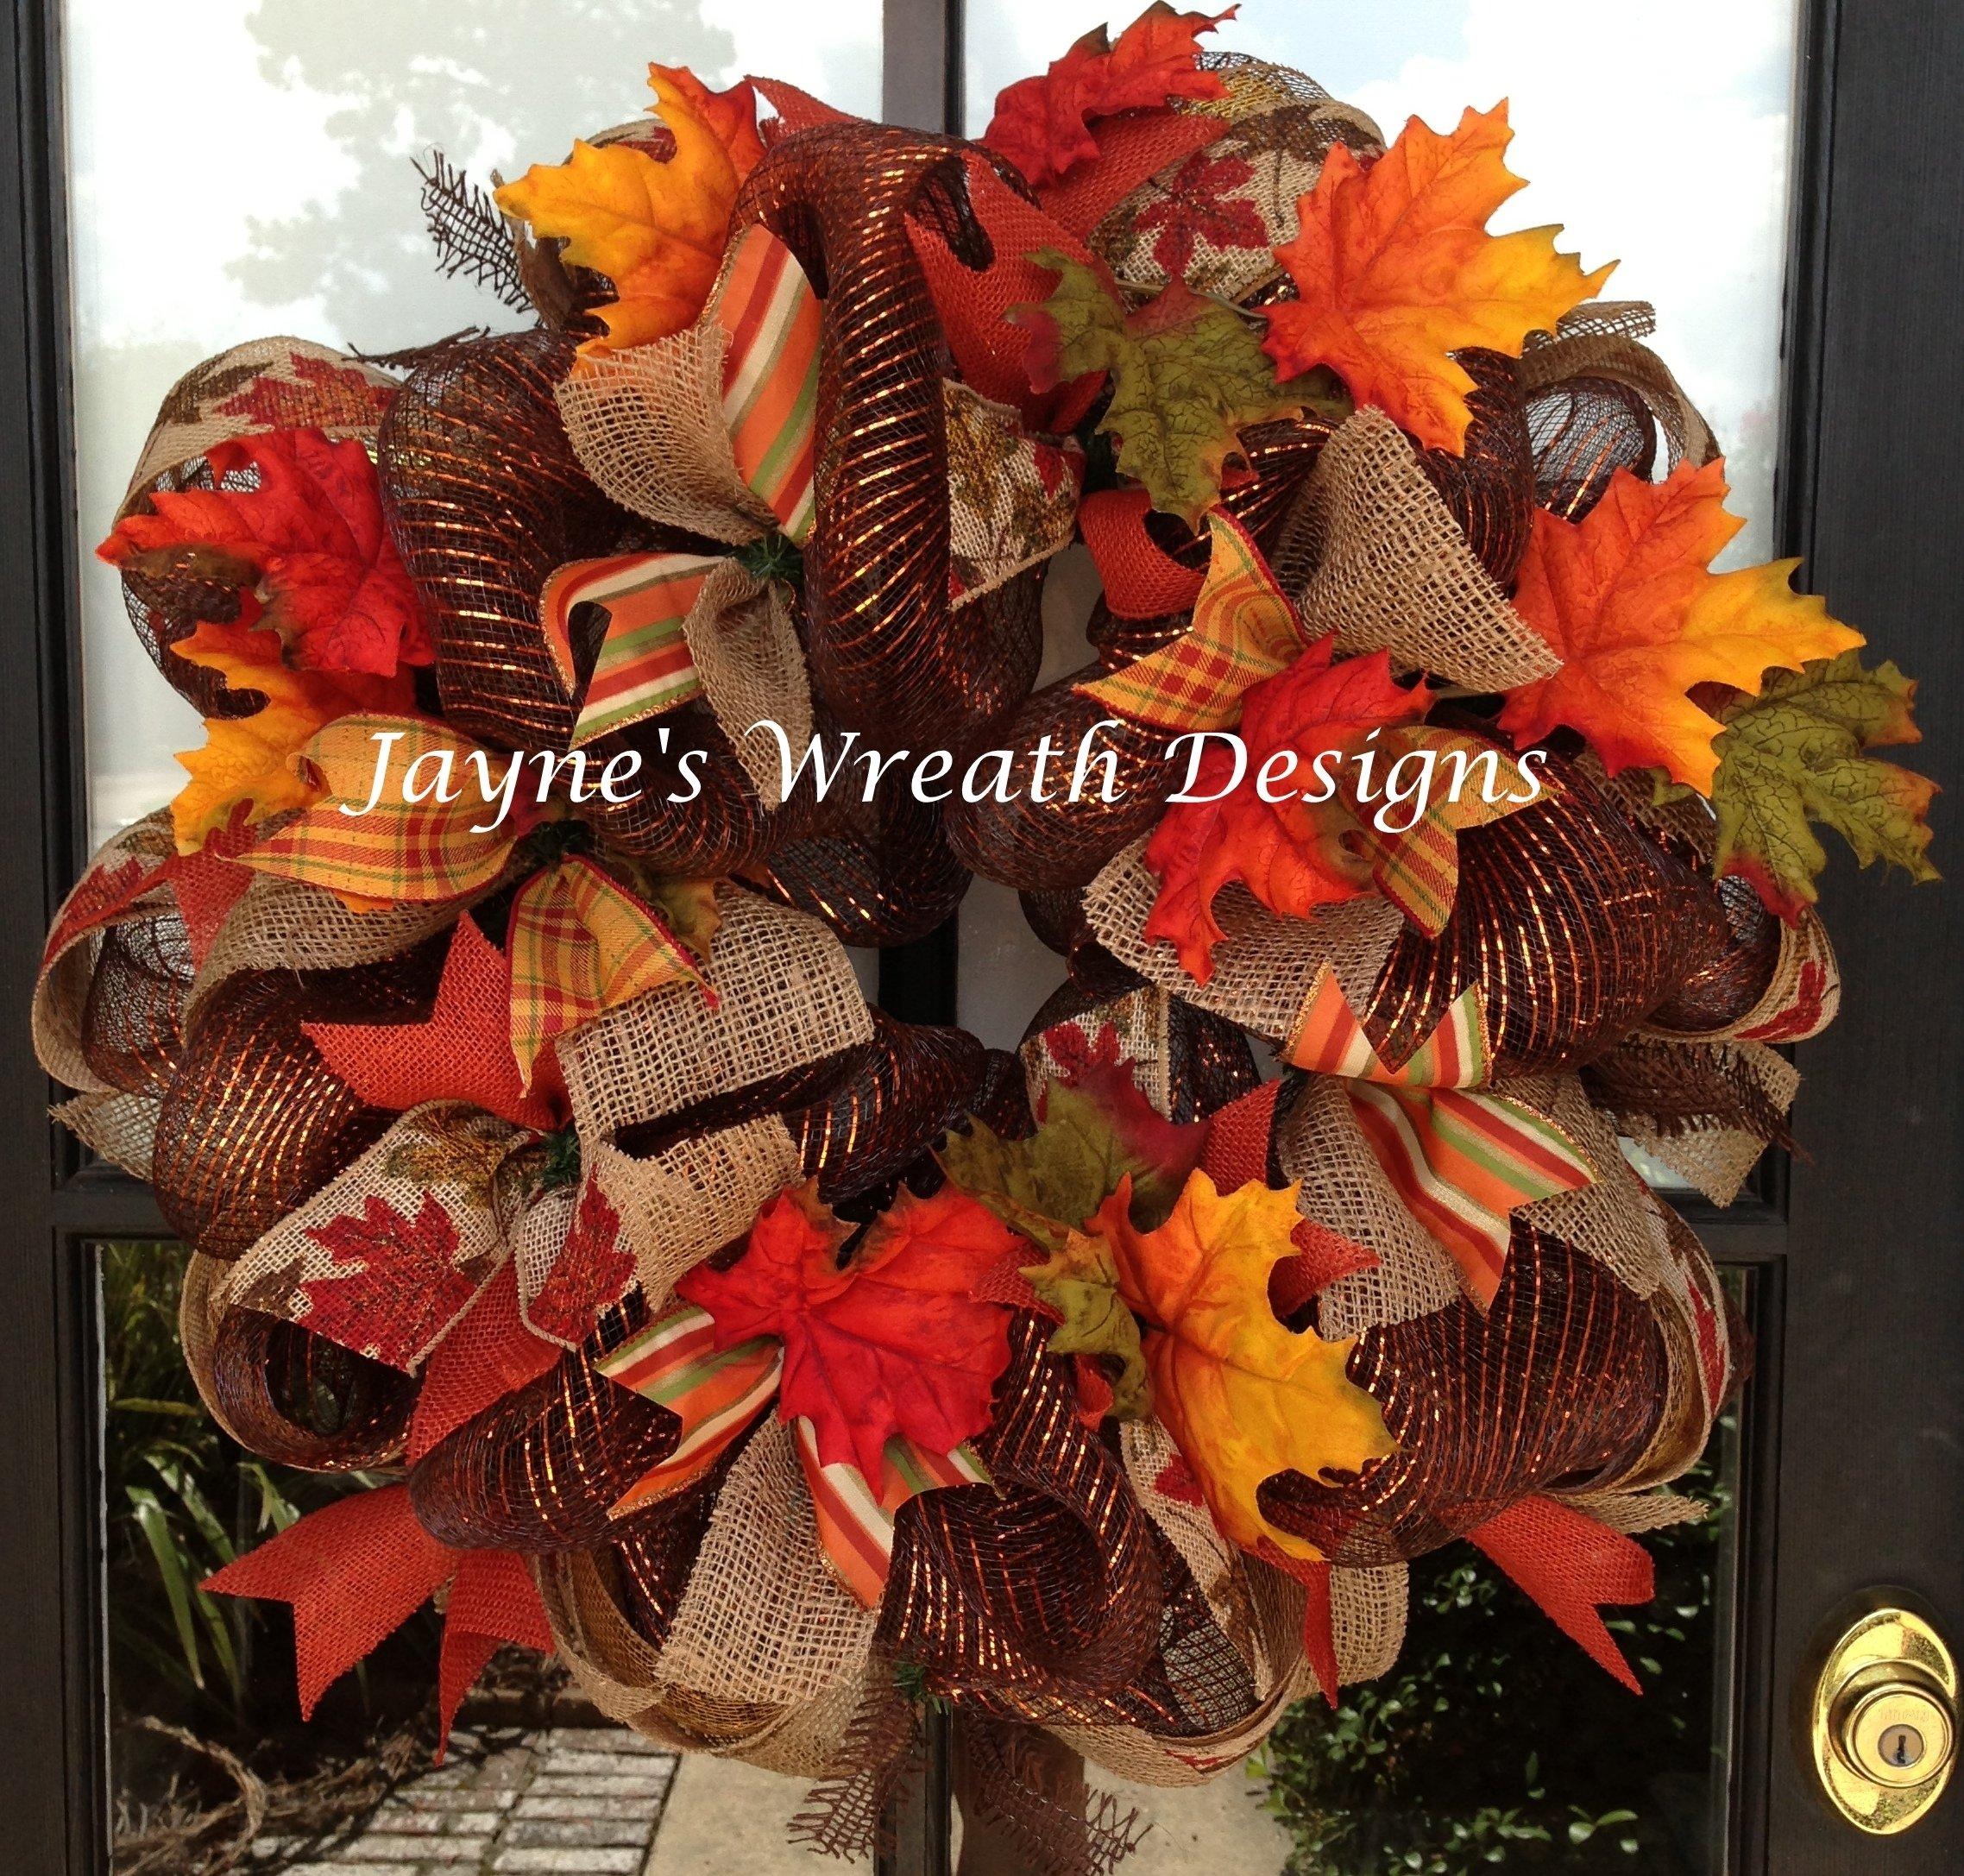 10 Fantastic Fall Wreath Ideas With Deco Mesh fall wreaths ideas mforum